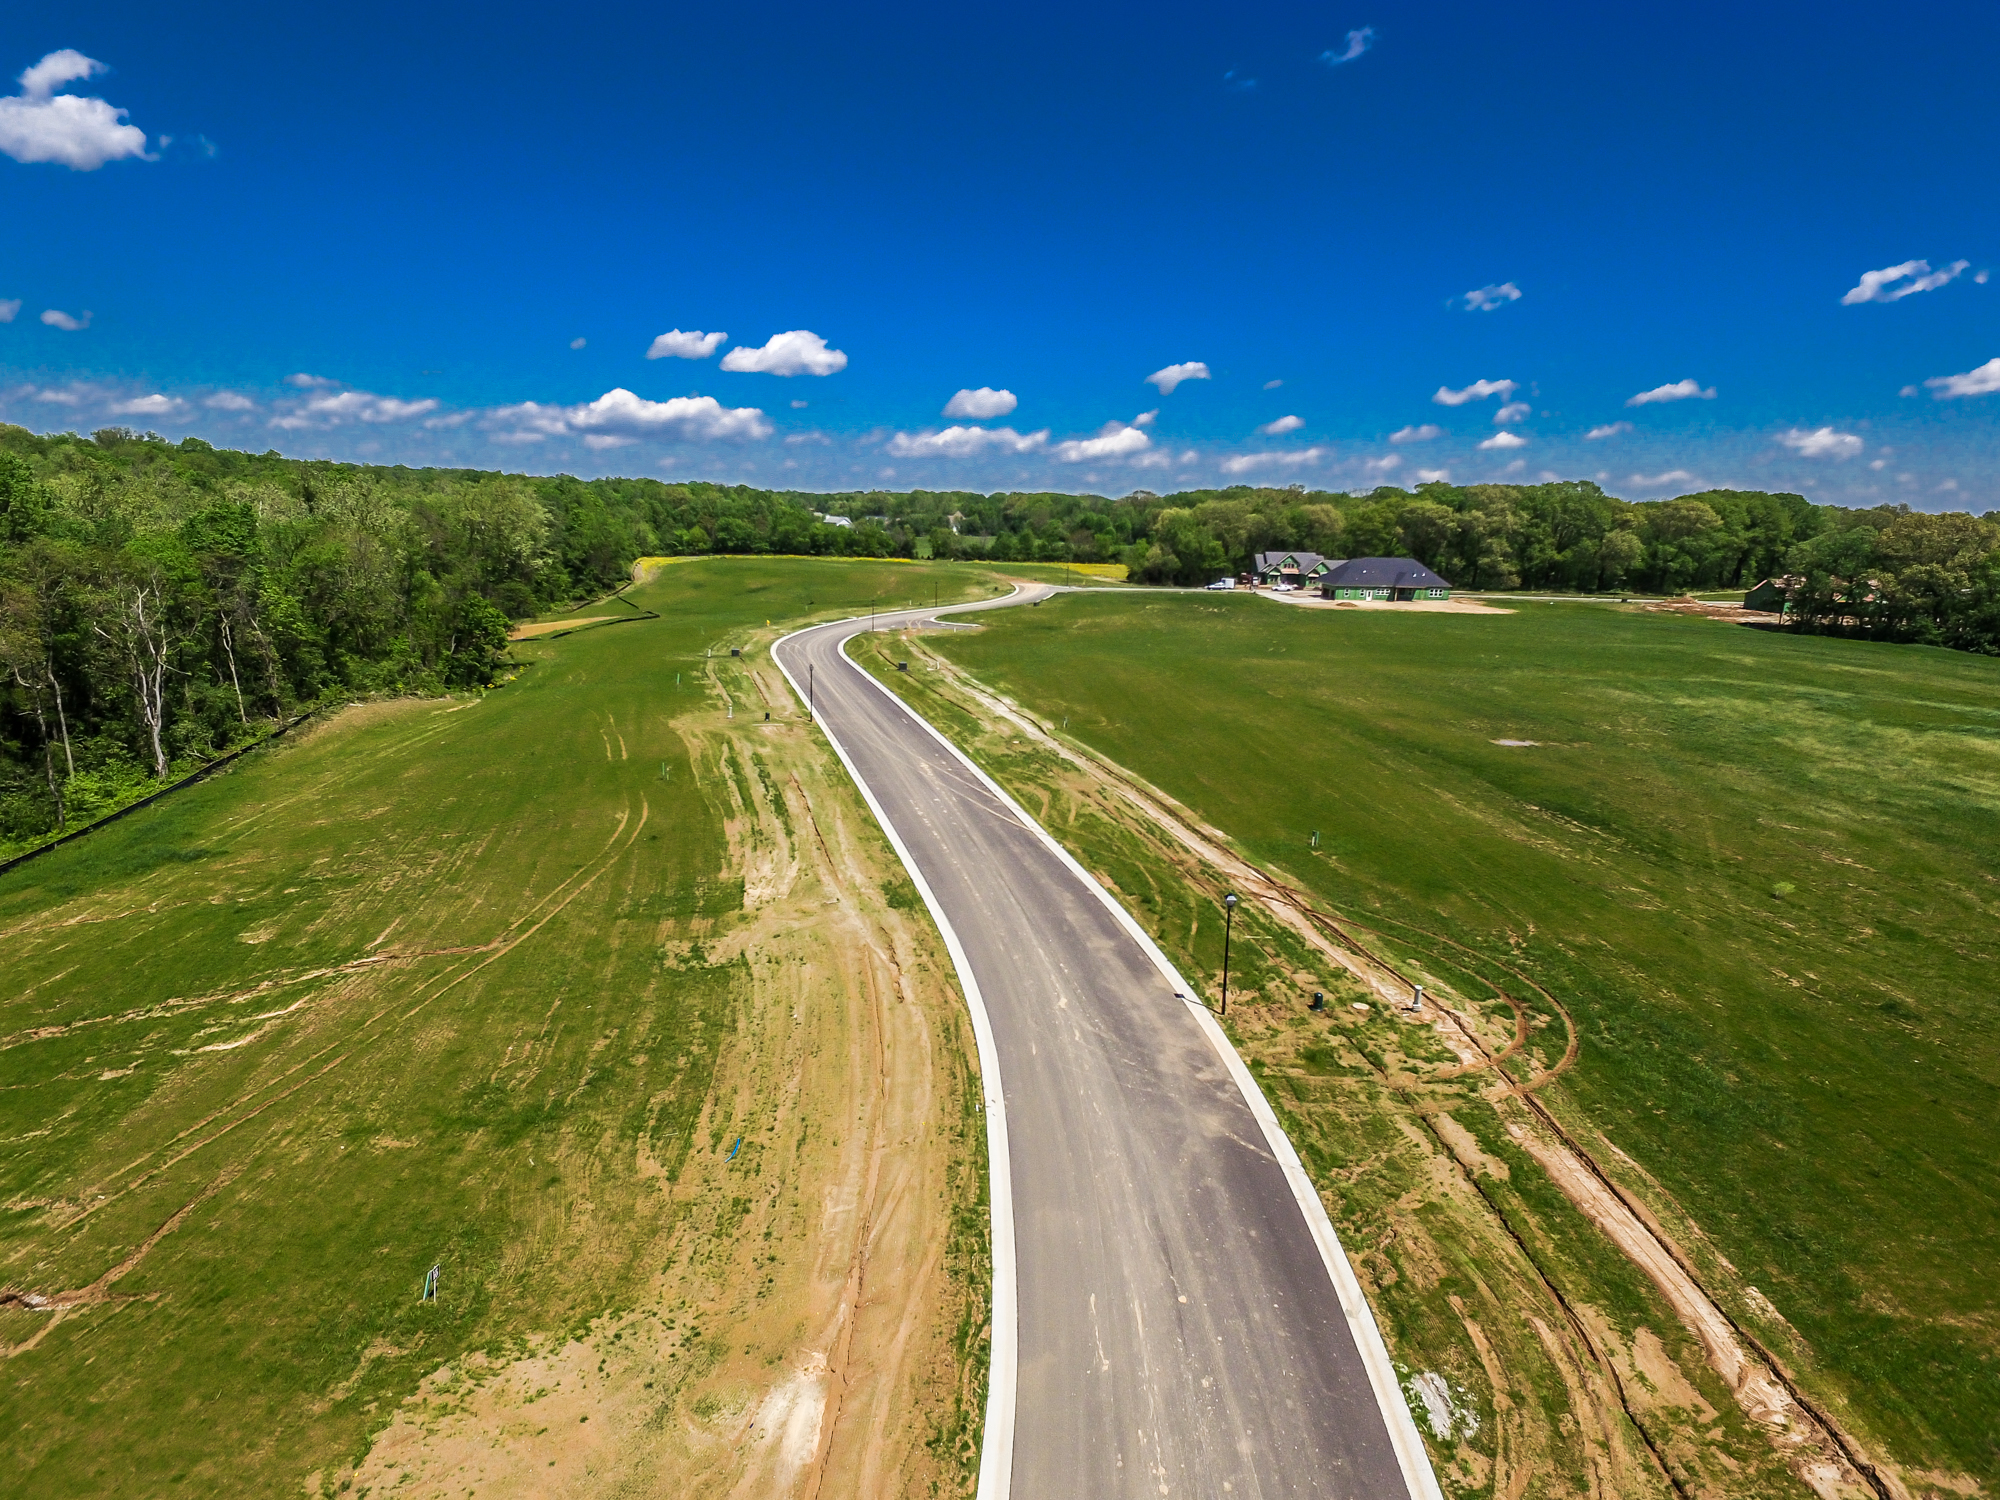 Bethel_Ridge_Farms_O'Fallon_Illinois_Aerials_Progress_5.3.17-11.jpg